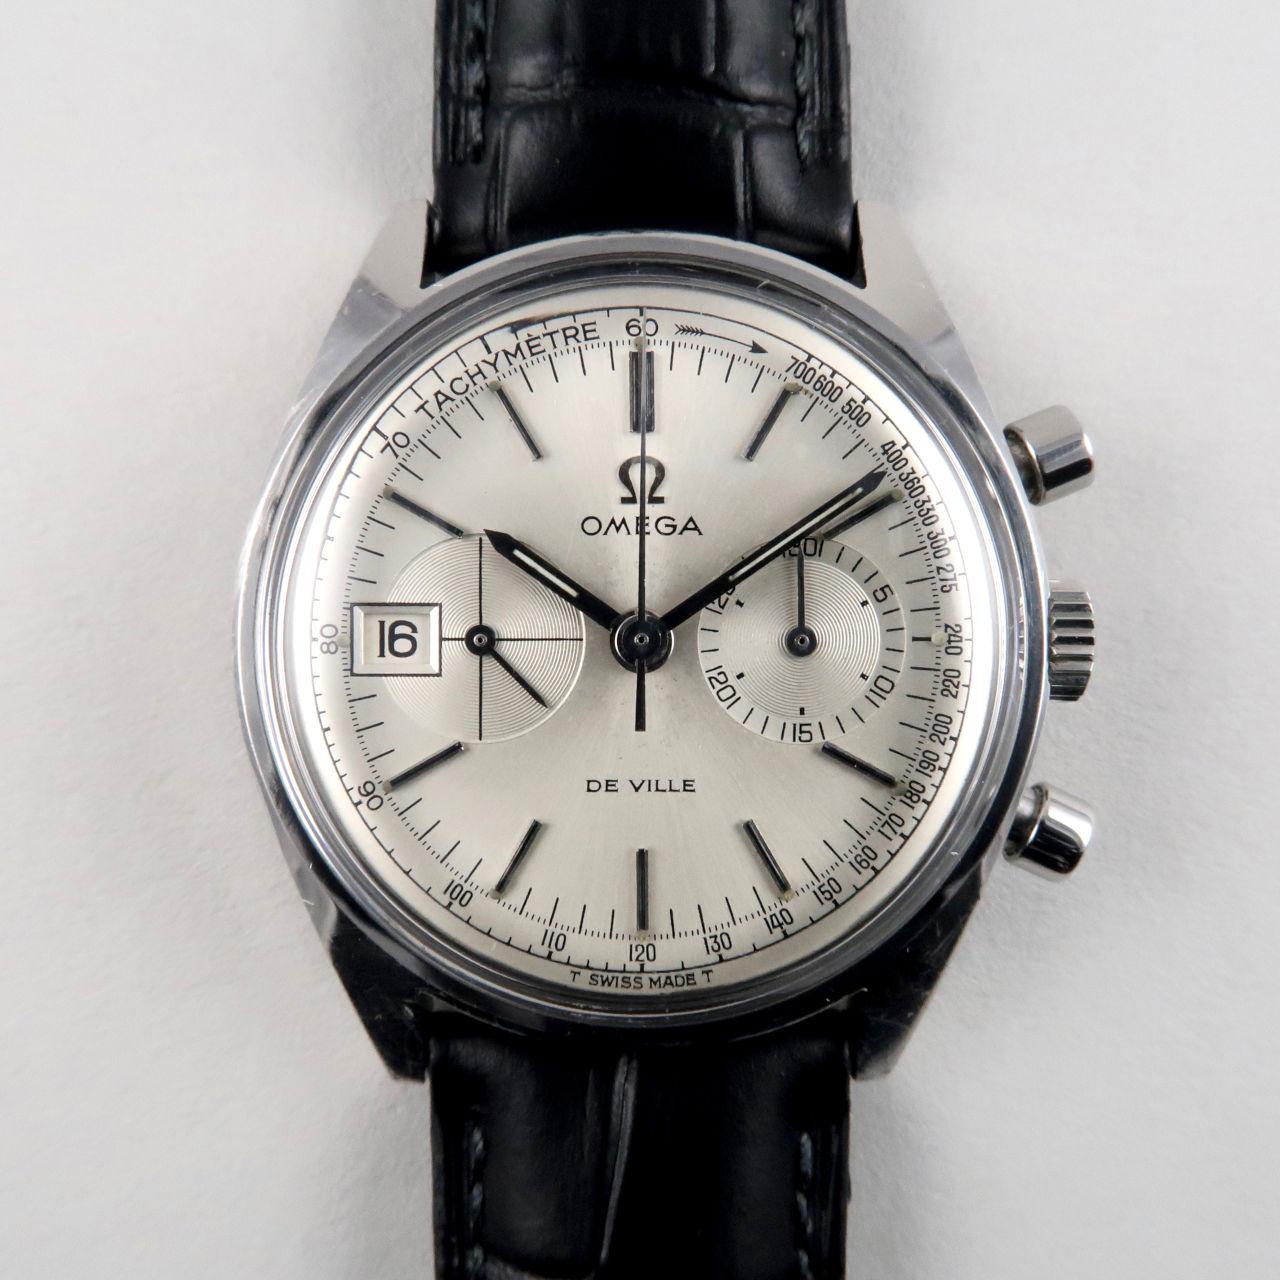 omega-de-ville-ref-146-017-steel-vintage-chronograph-circa-1970-wxodvc-v01